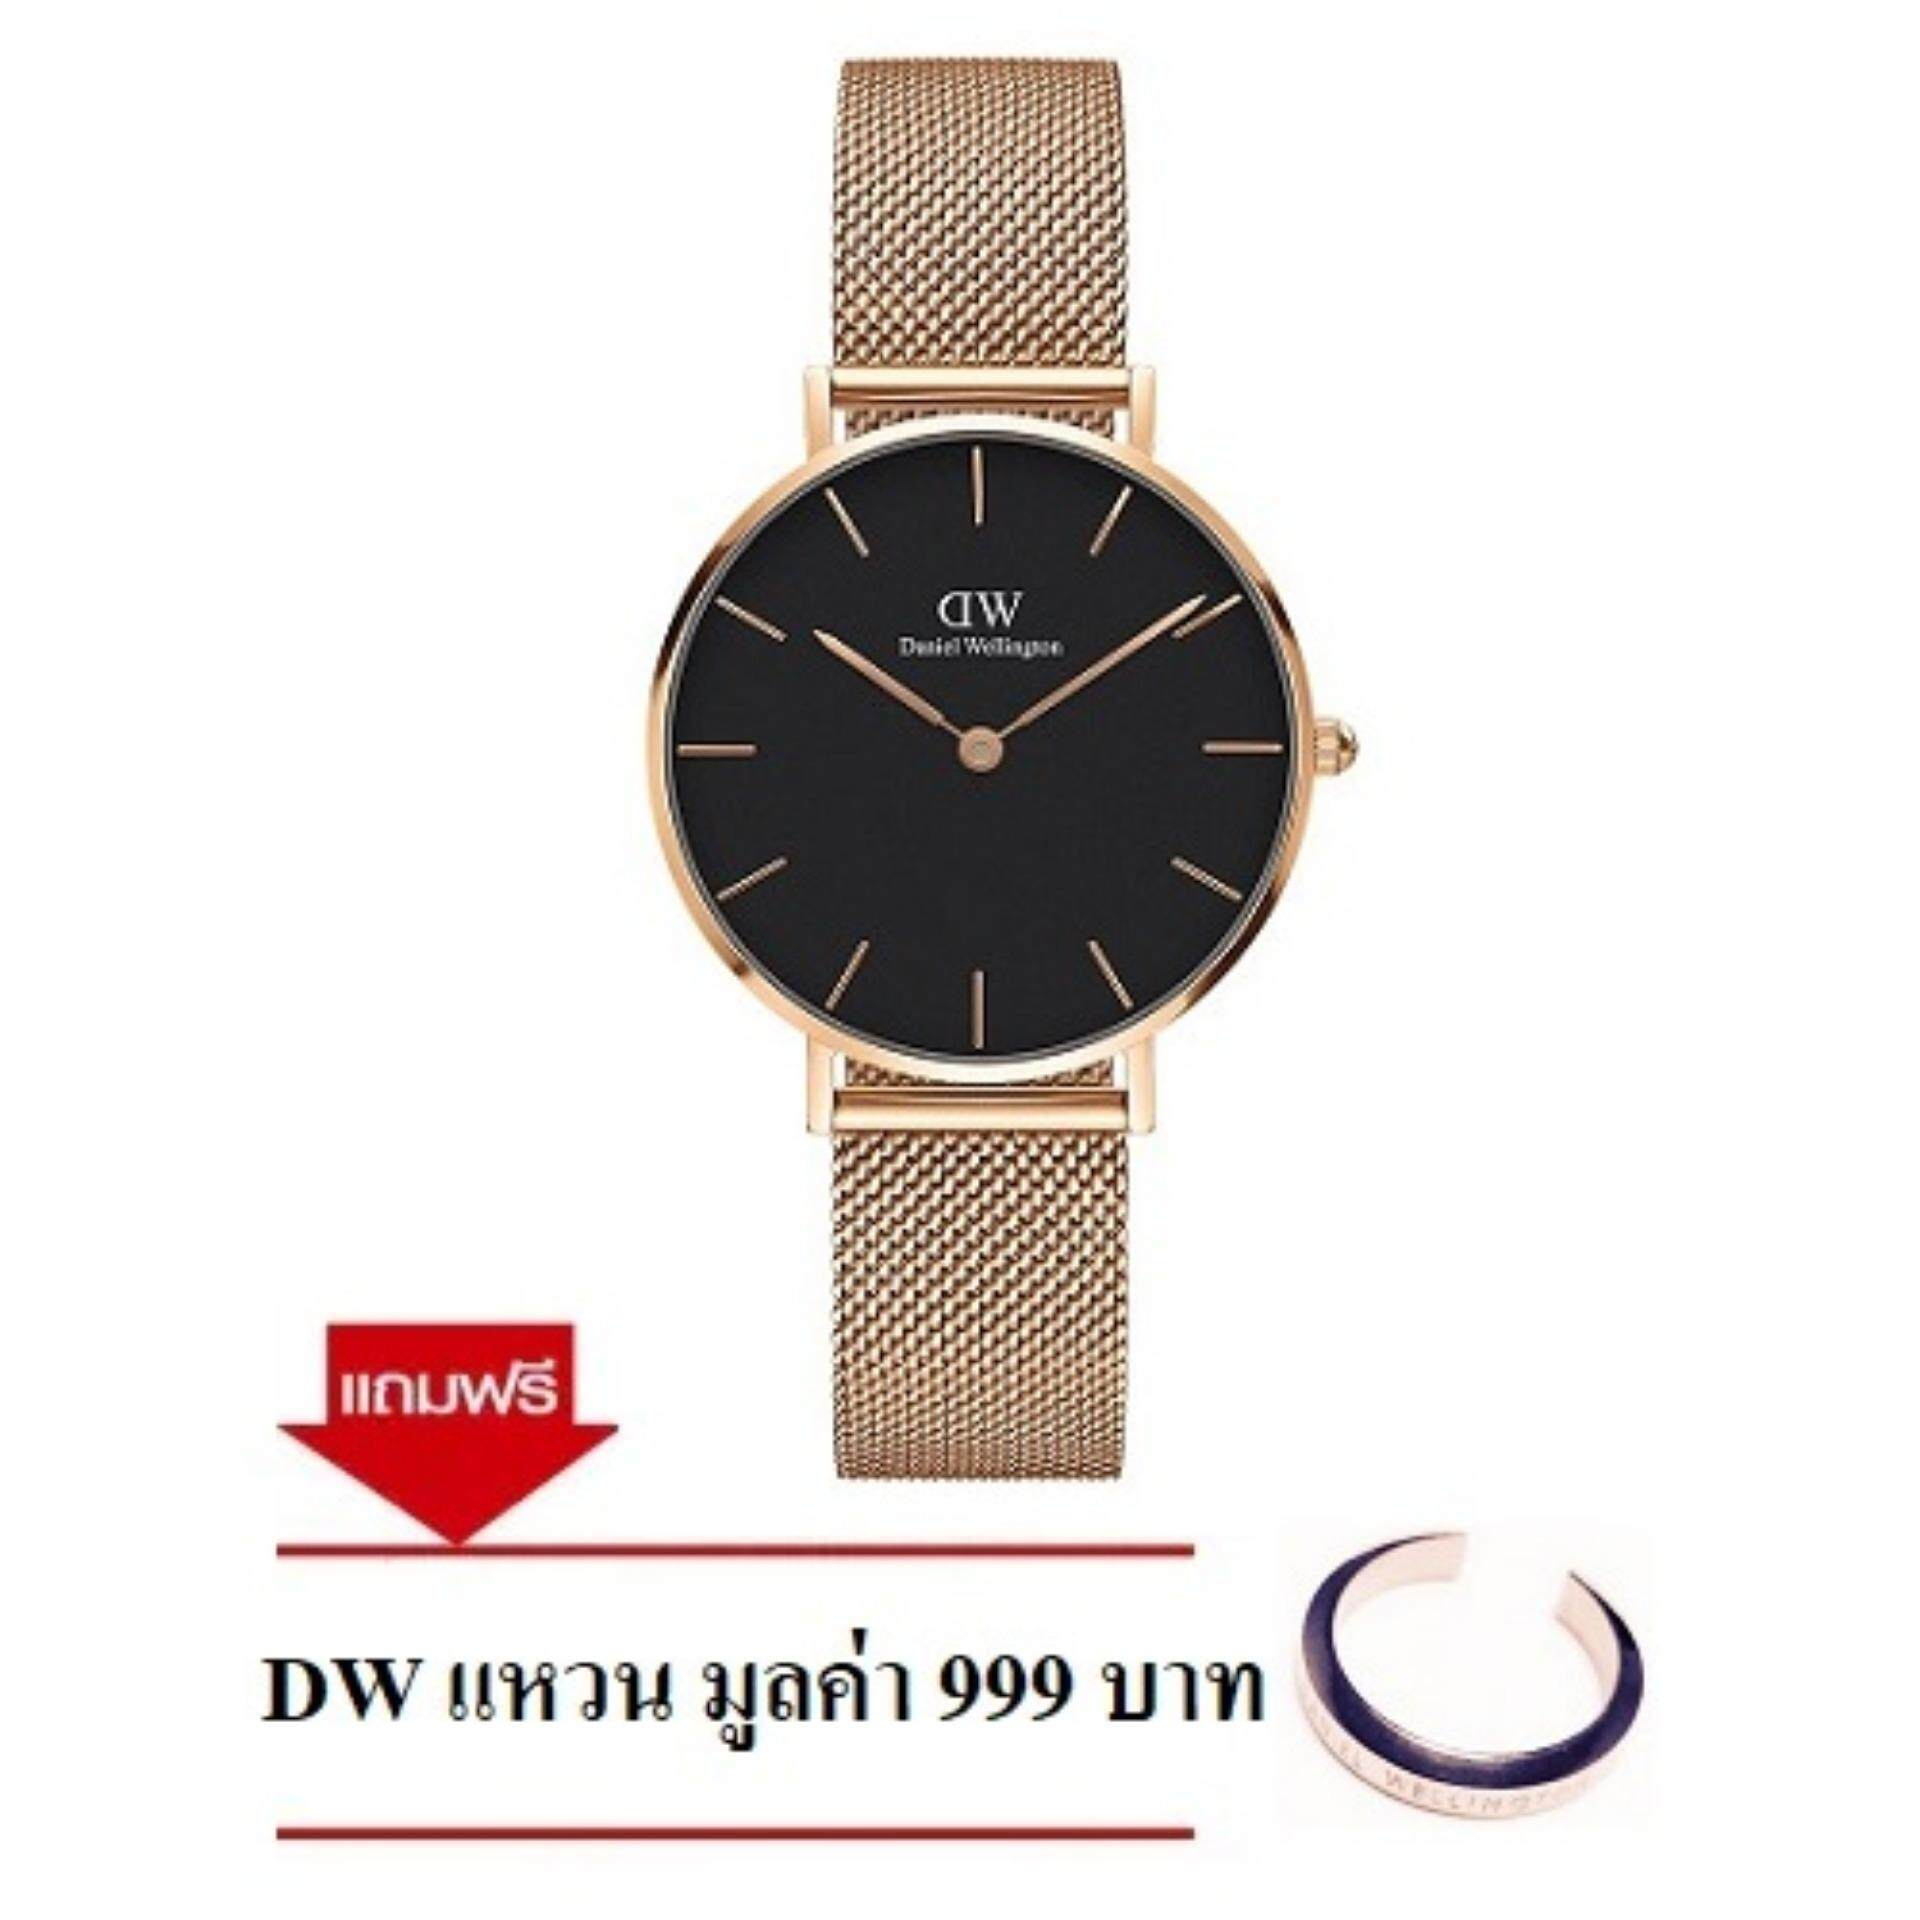 Daniel Wellington Dw00100161/dw00100162 Classic Petite Melrose 32Mm นาฬิกาข้อมือ นาฬิกาแฟชั่น ผู้หญิง เหล็กสาน สีทองแดง Fashion Black Dial Mesh Strap Women Watch เป็นต้นฉบับ